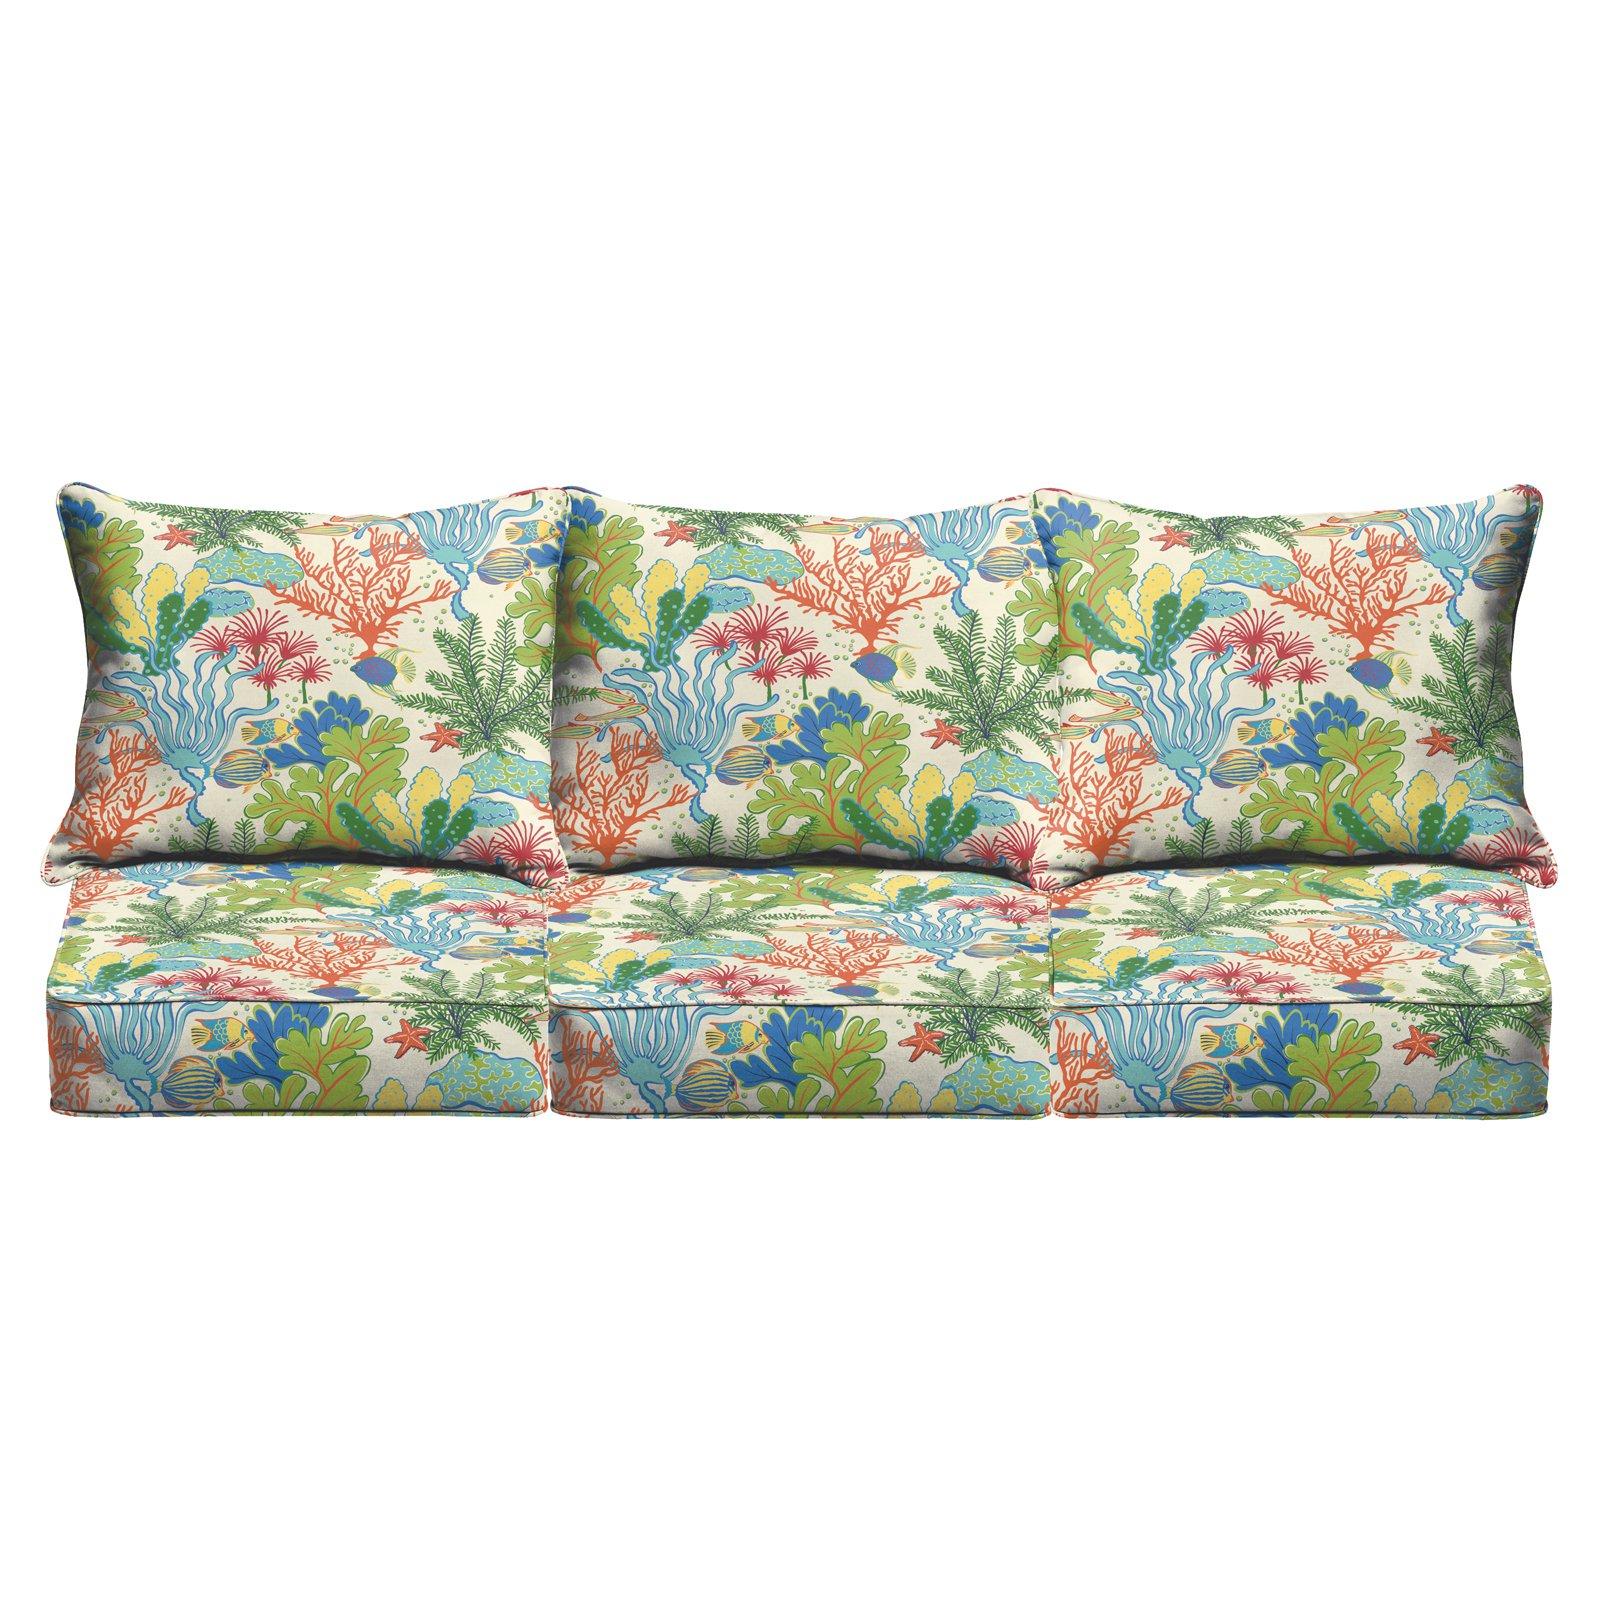 Mozaic Company Splish Splash Terrace 6 Piece Outdoor Corded Sofa Pillow and Cushion Set